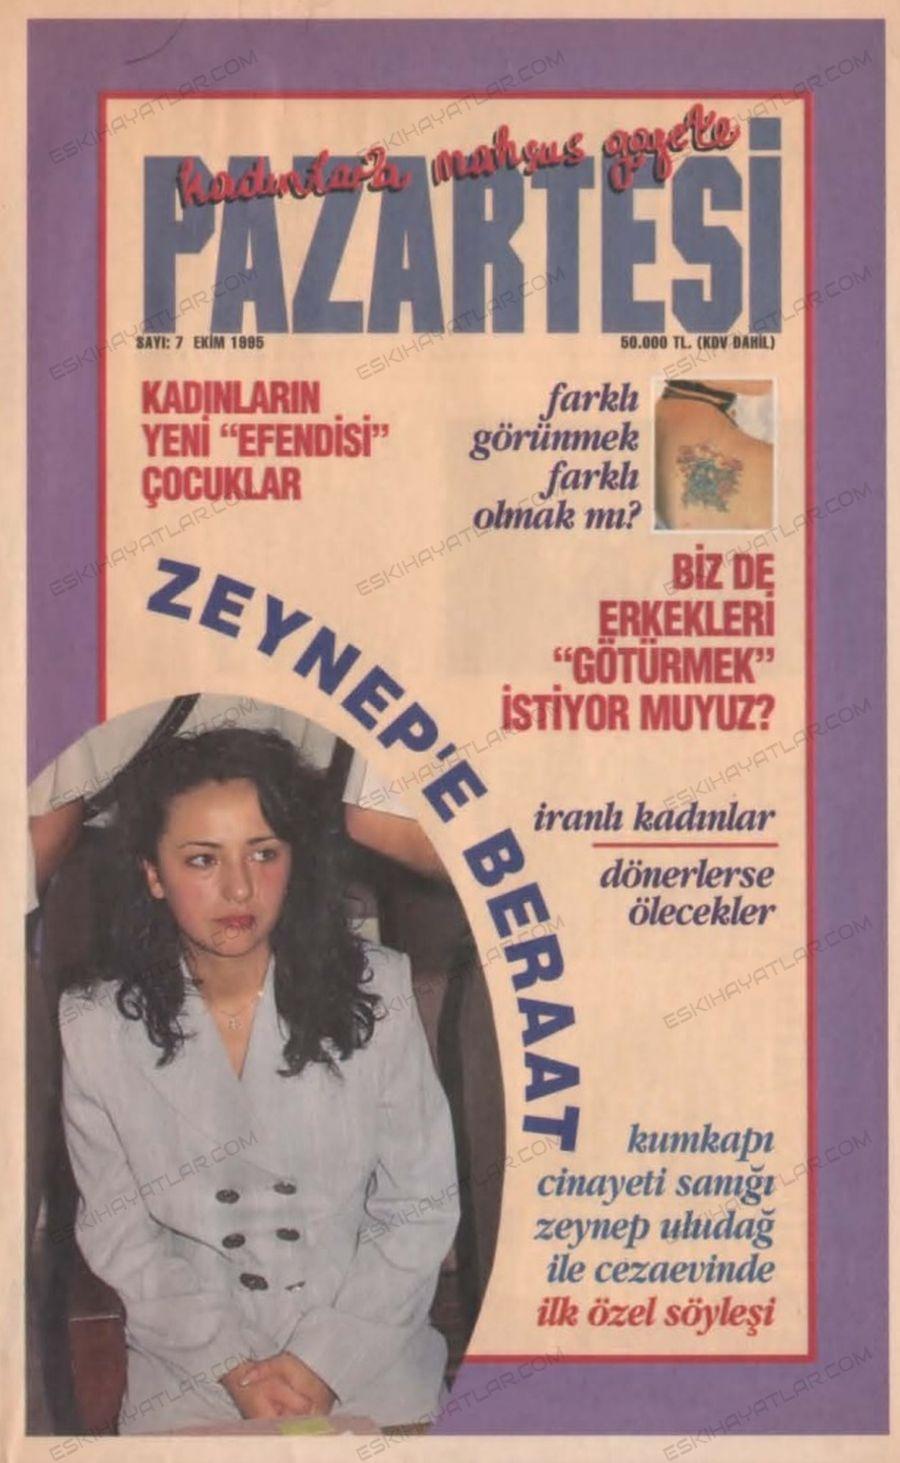 0239-kumkapi-cinayeti-1998-aktuel-dergisi-gulten-kizilkaya-kumkapi-dulu-kimdir (WW2W)